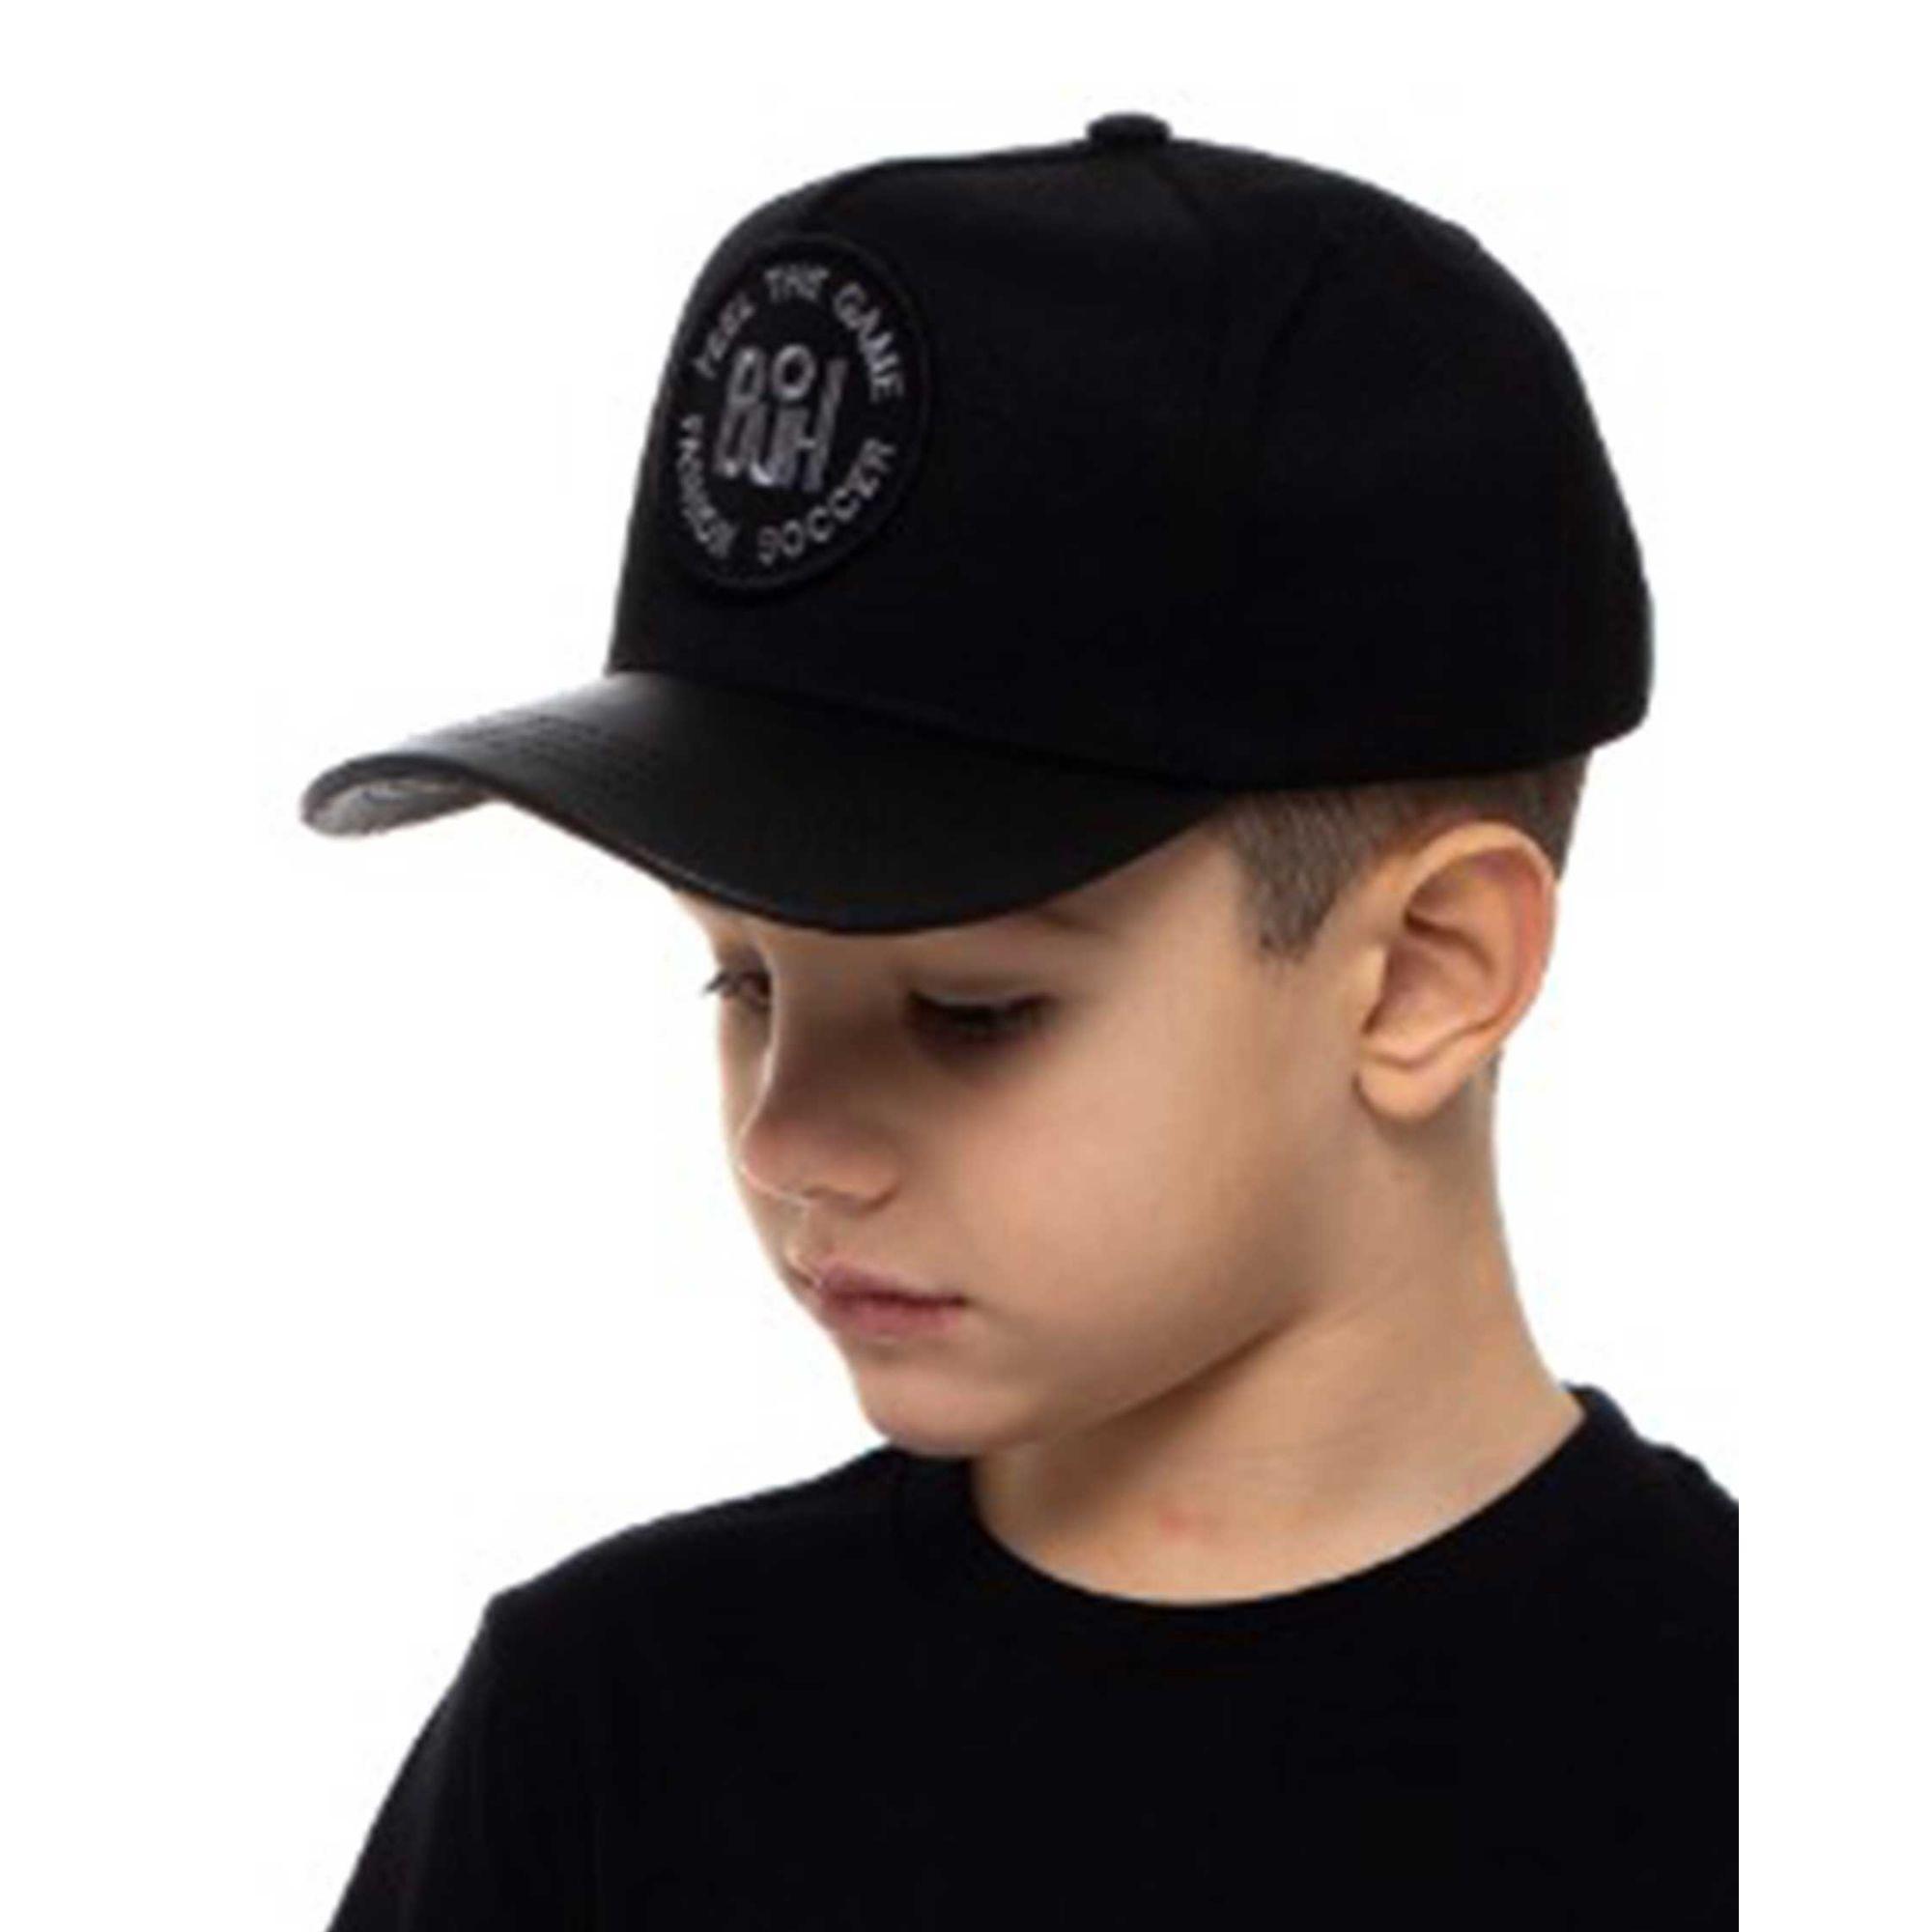 Boné Buh TBT Kids Aba de Couro Black